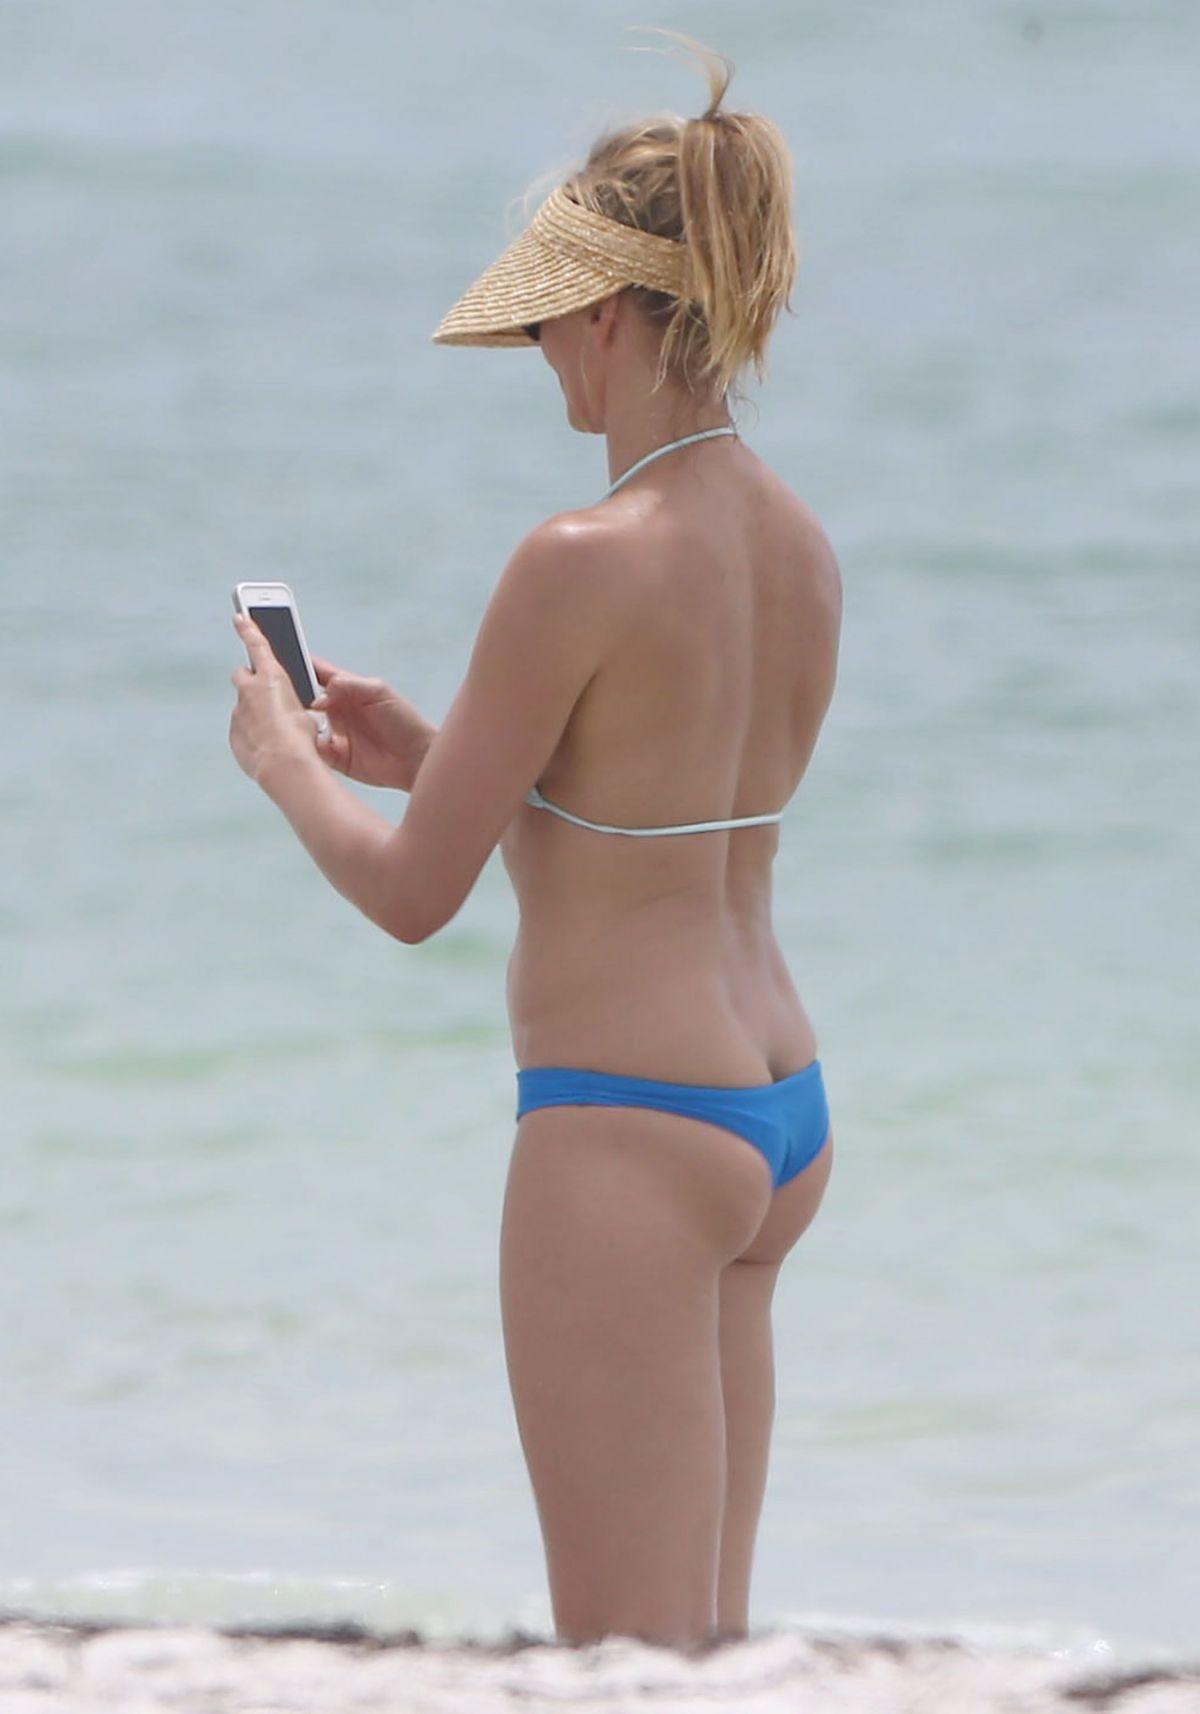 CAMERON DIAZ in Bikini at a Beach in Florida - HawtCelebs